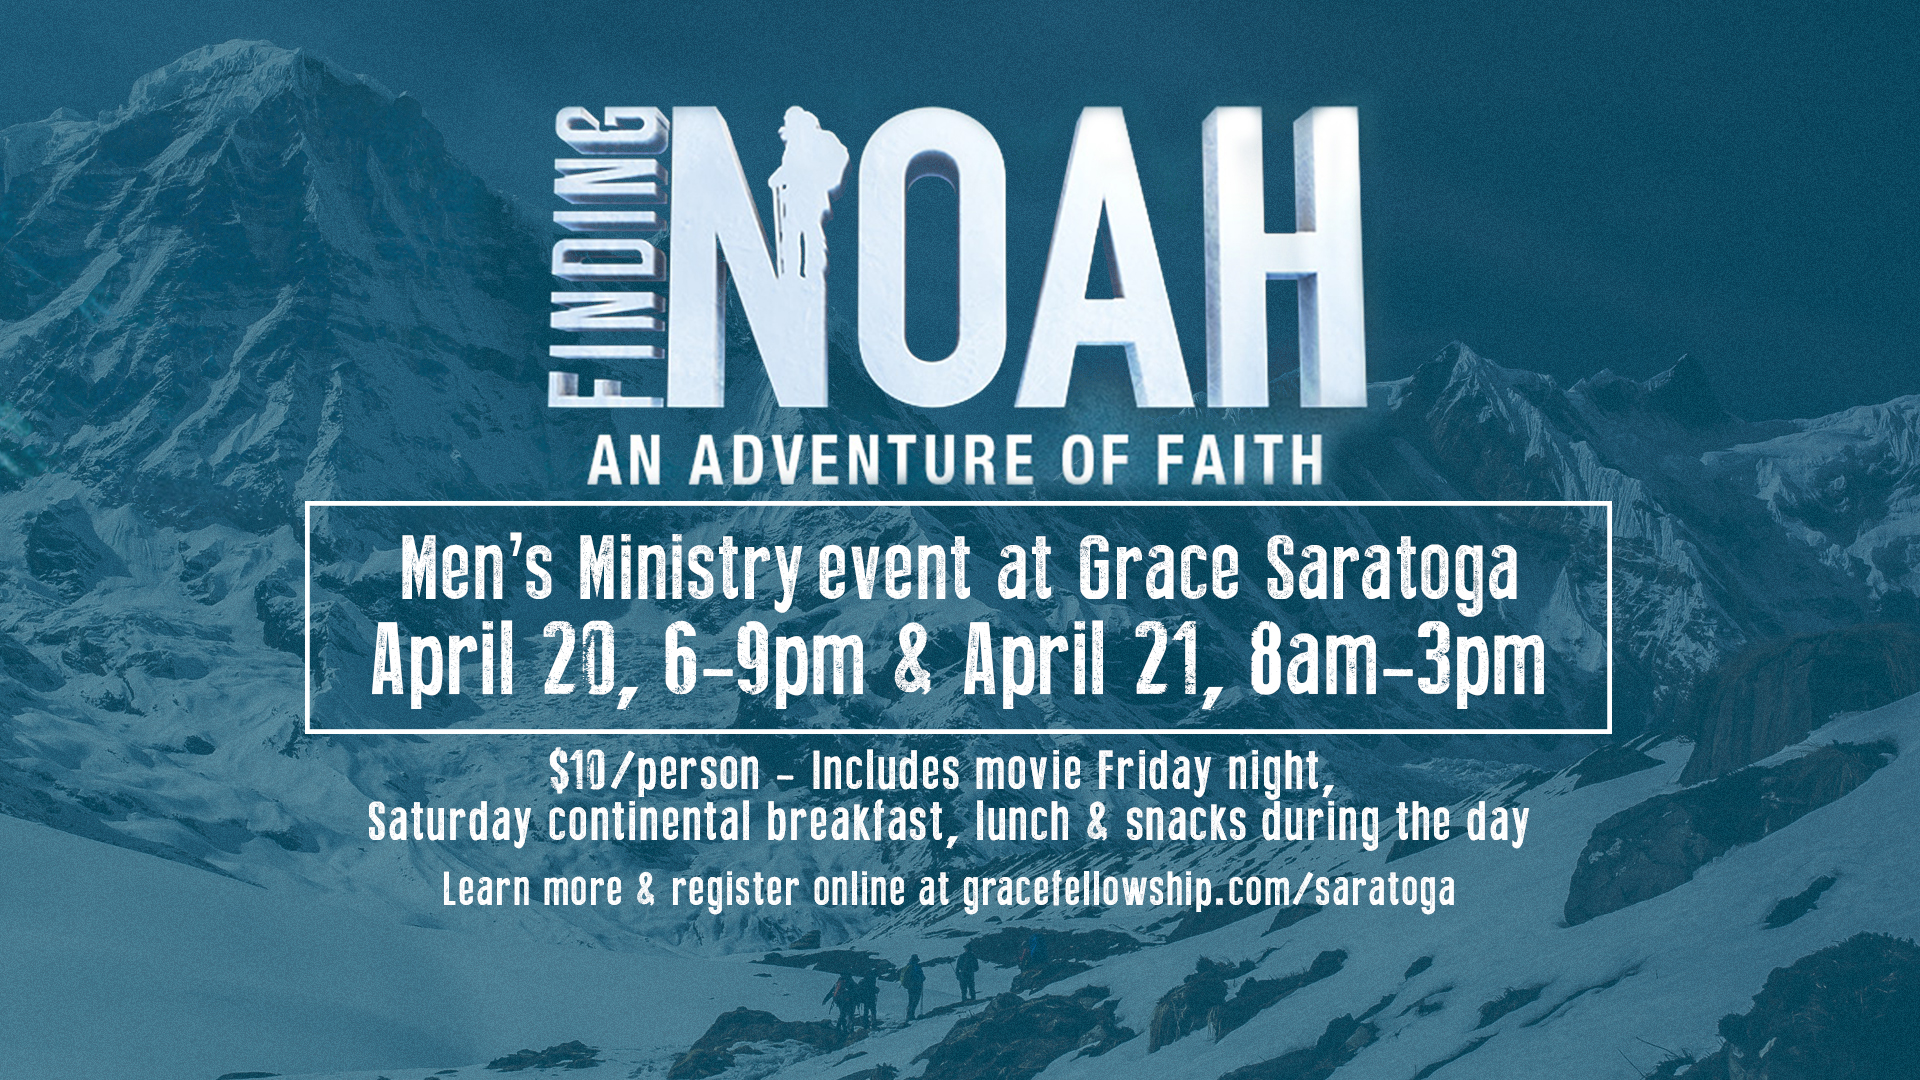 Finding Noah: An Adventure of Faith